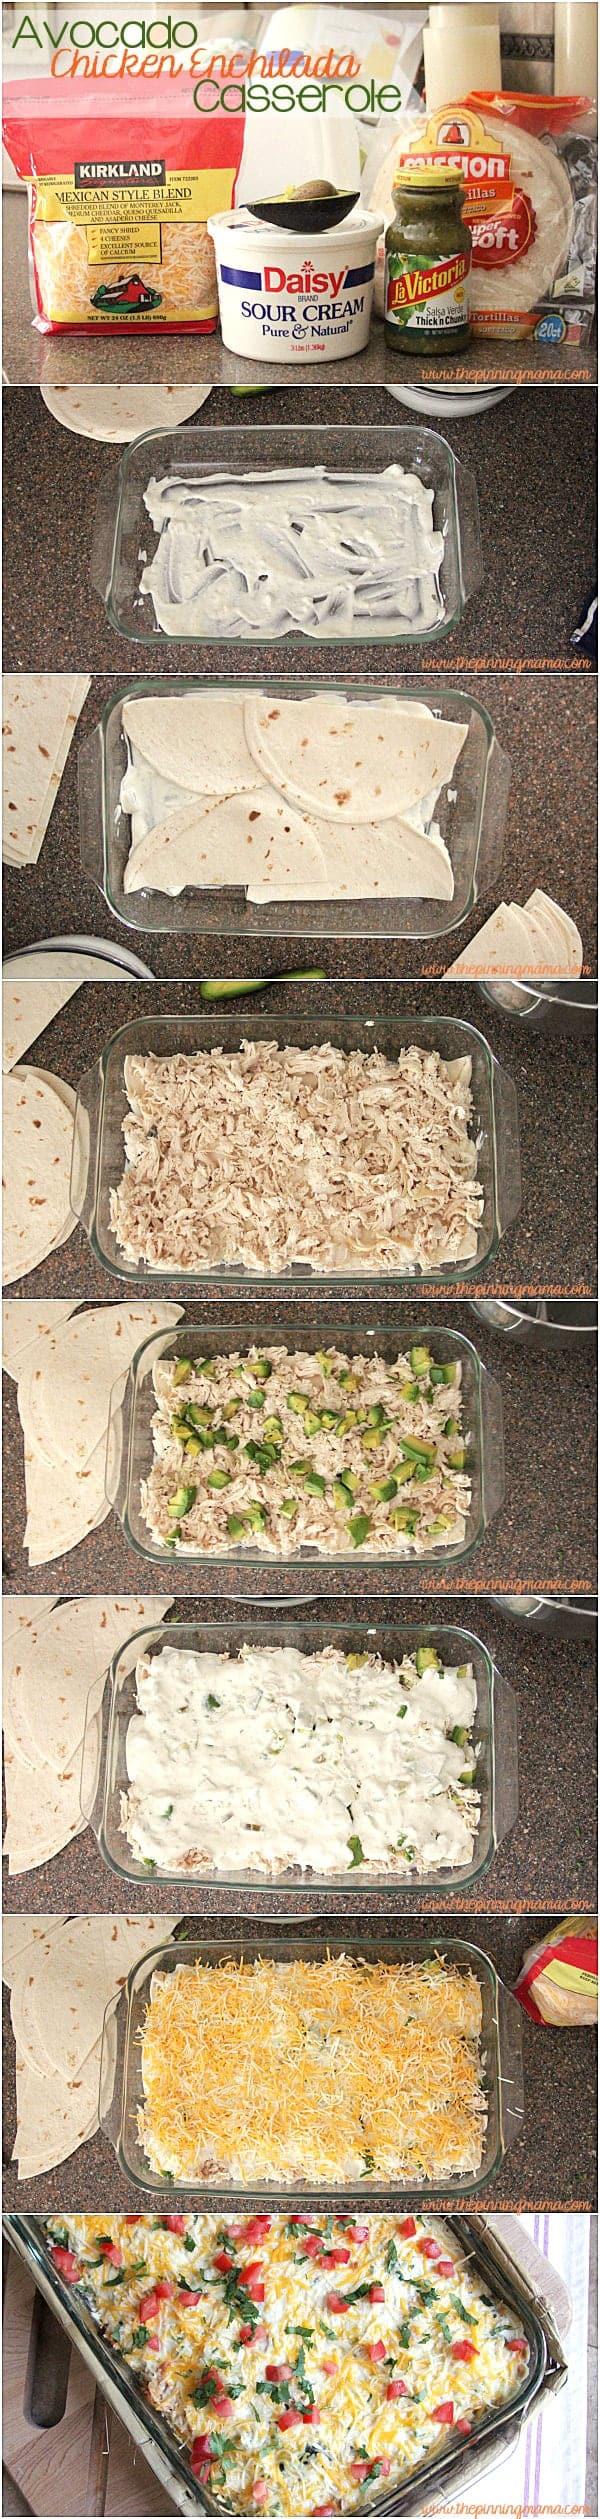 An easy layered dinner! Avocado Chicken Enchilada Casserole